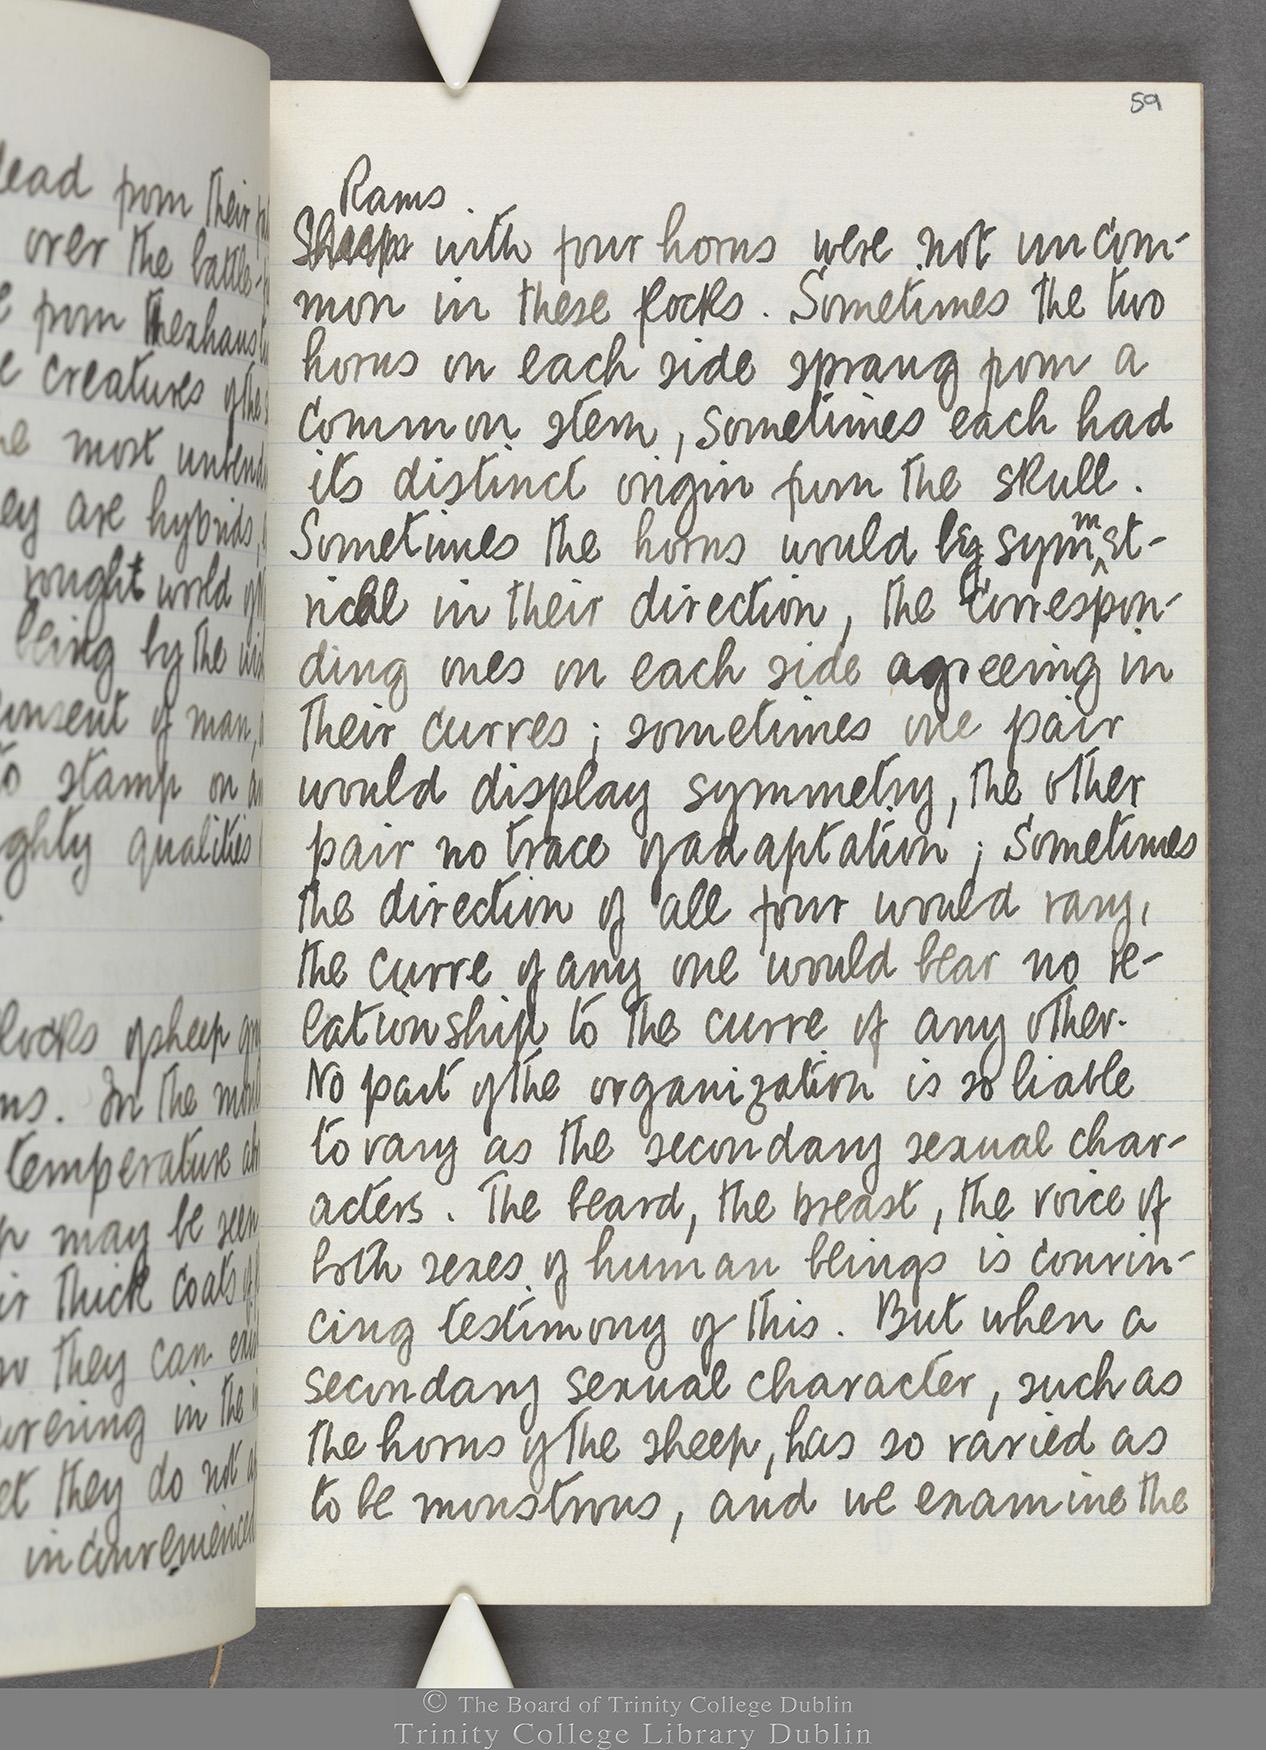 TCD MS 10516 folio 59 recto